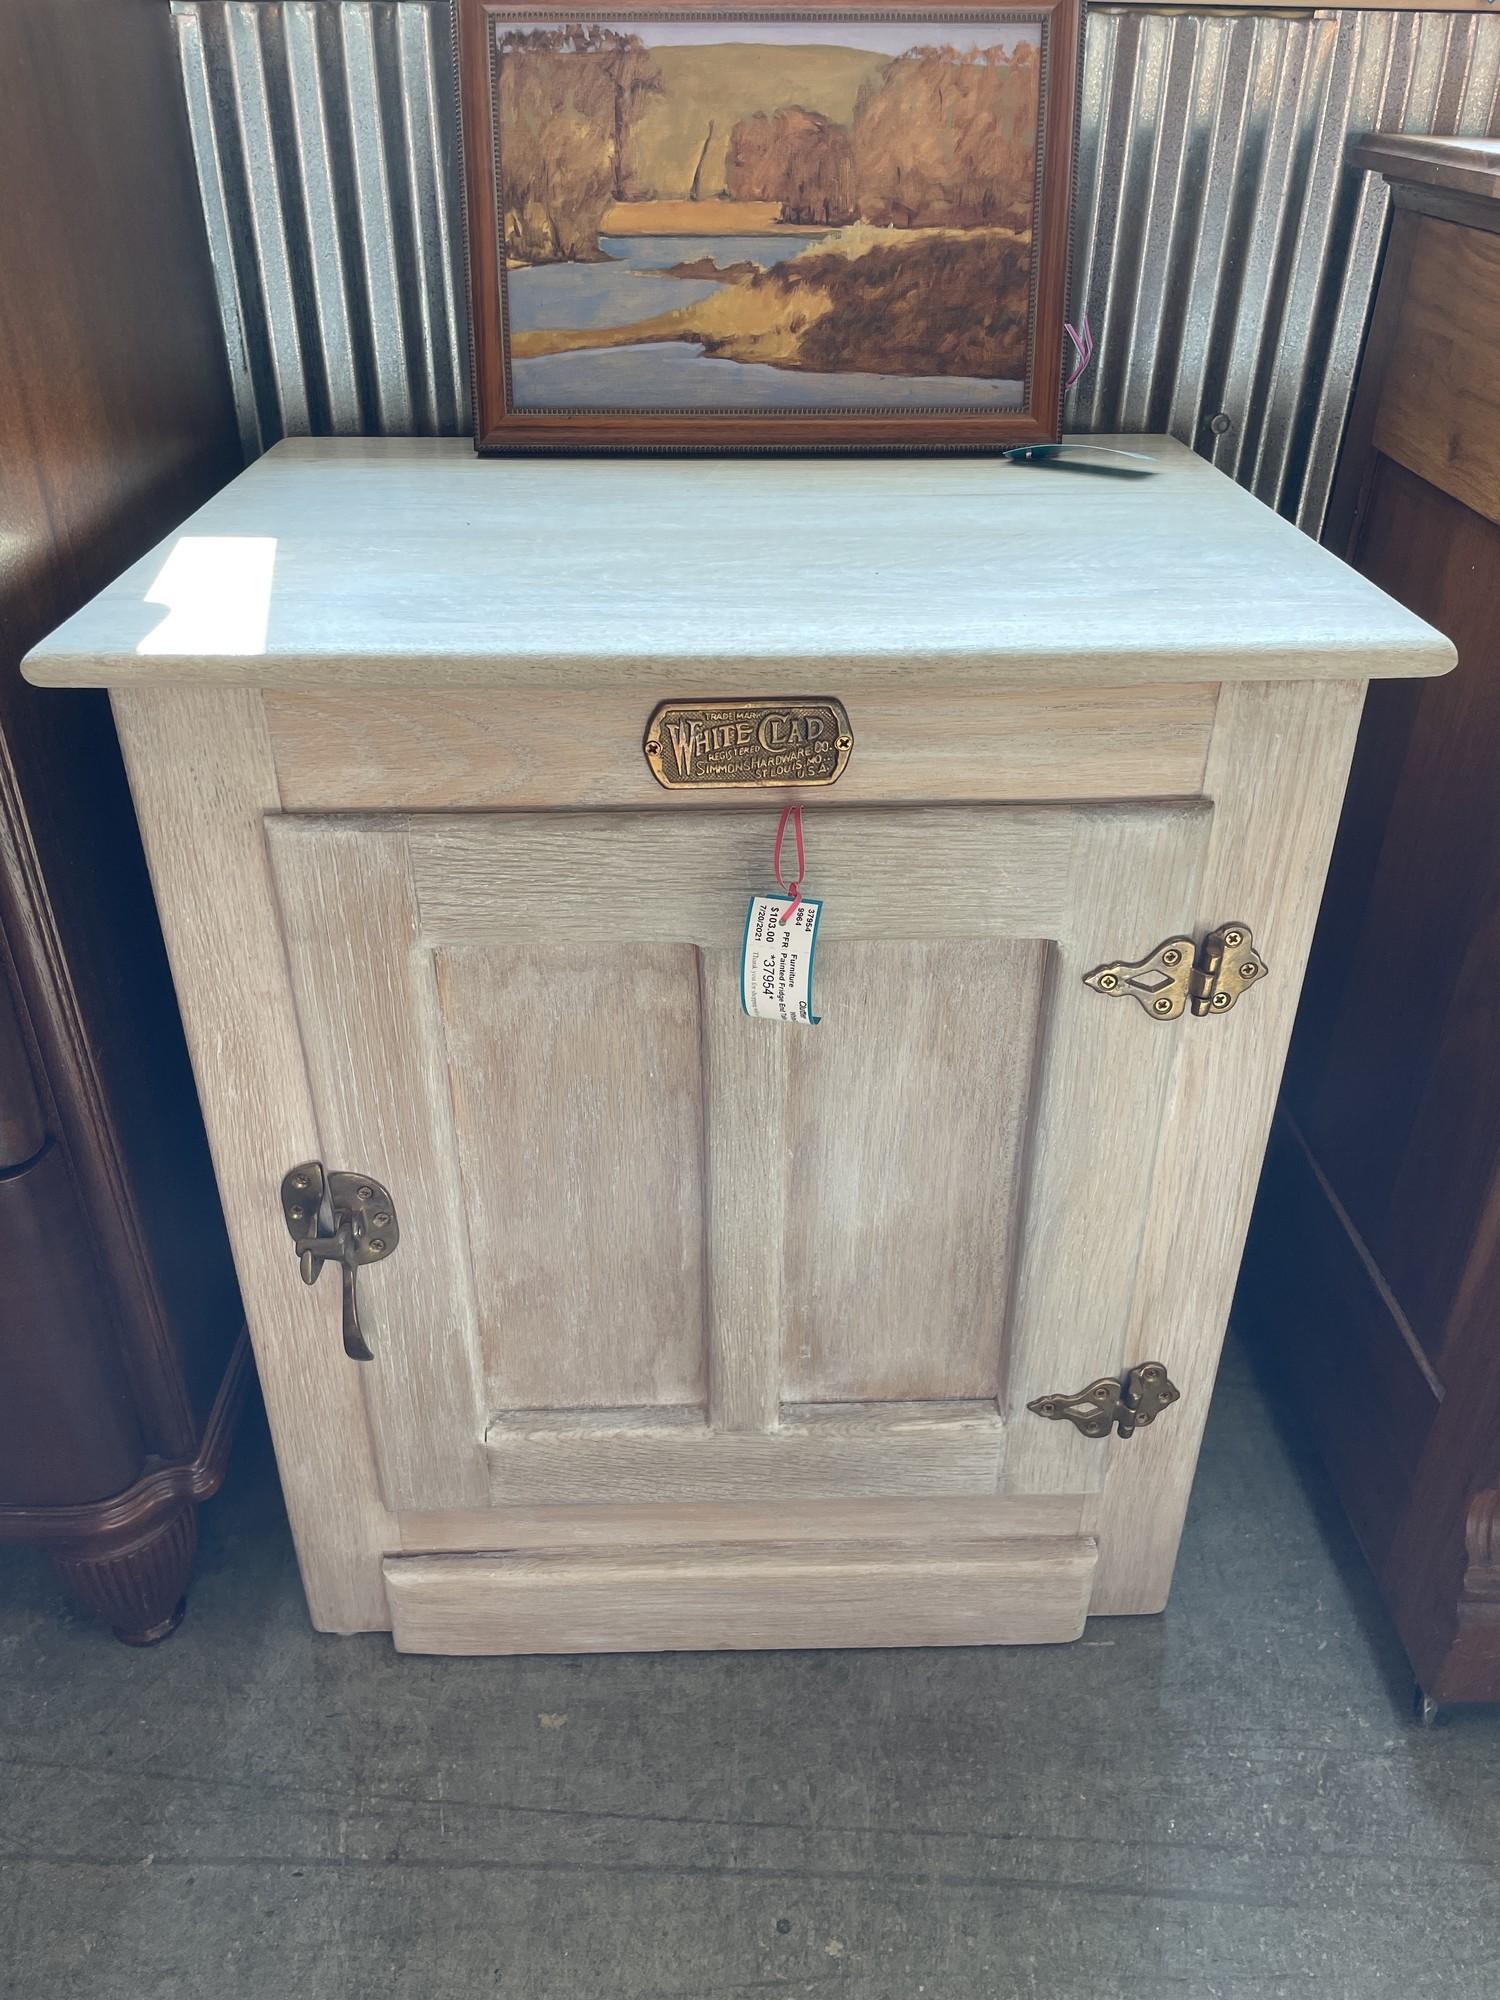 Painted Fridge End Table, WhiteCla, Size: 22.16.24